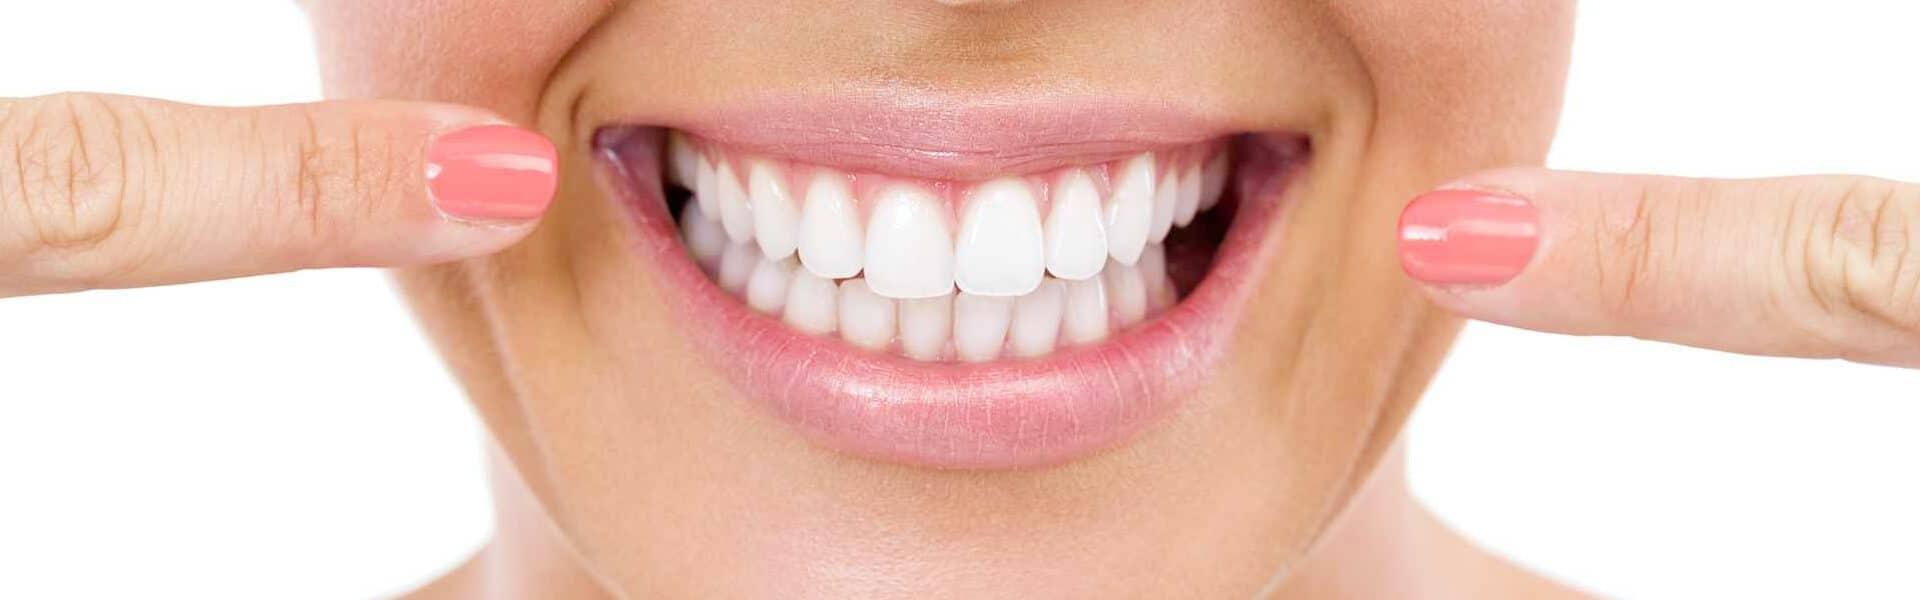 Tewksbury Teeth Whitening: What Type Is Best for You?